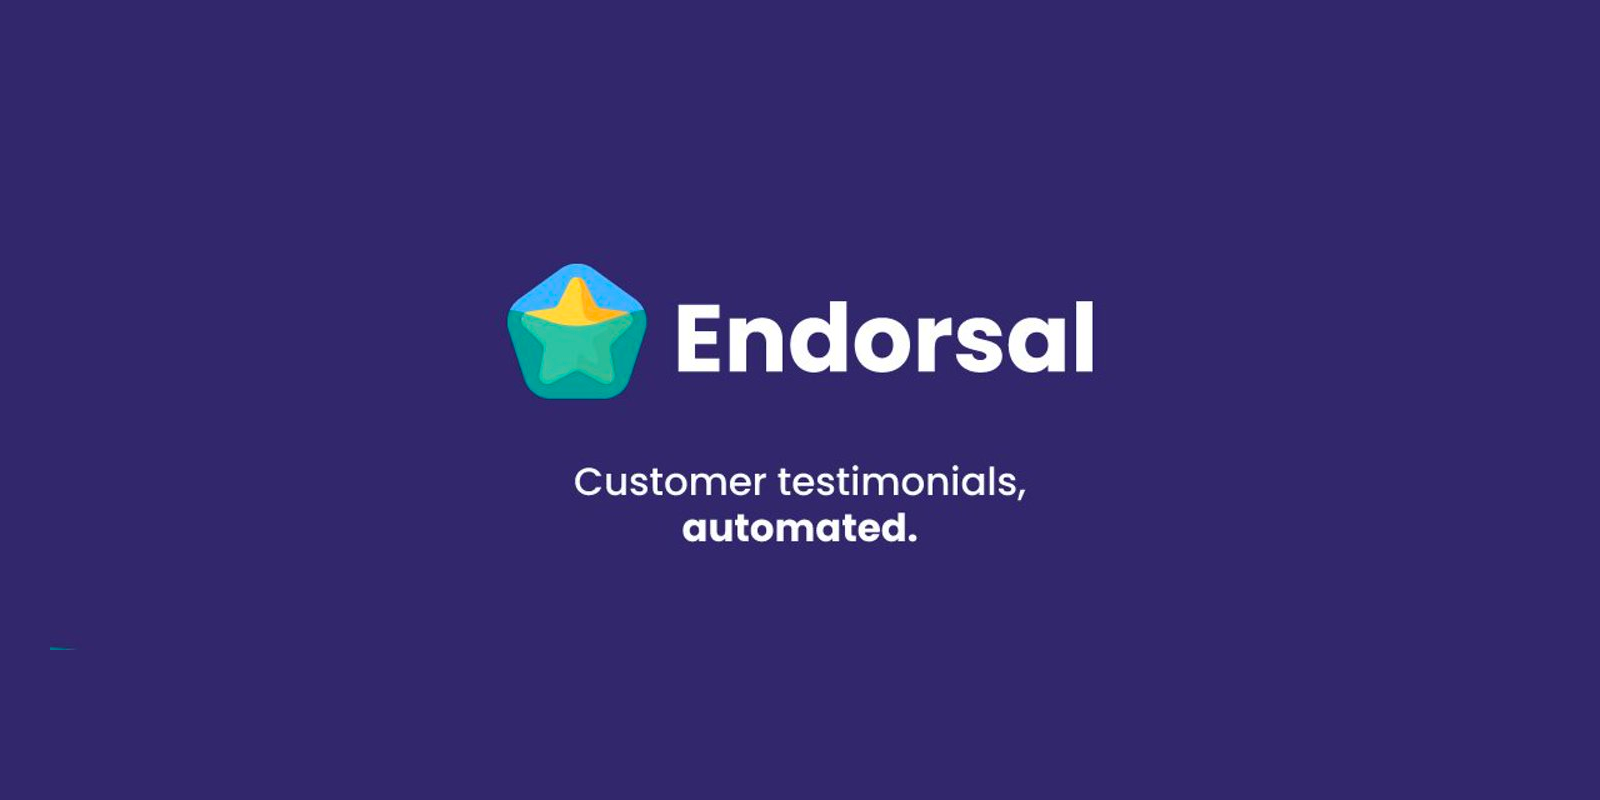 Endorsal